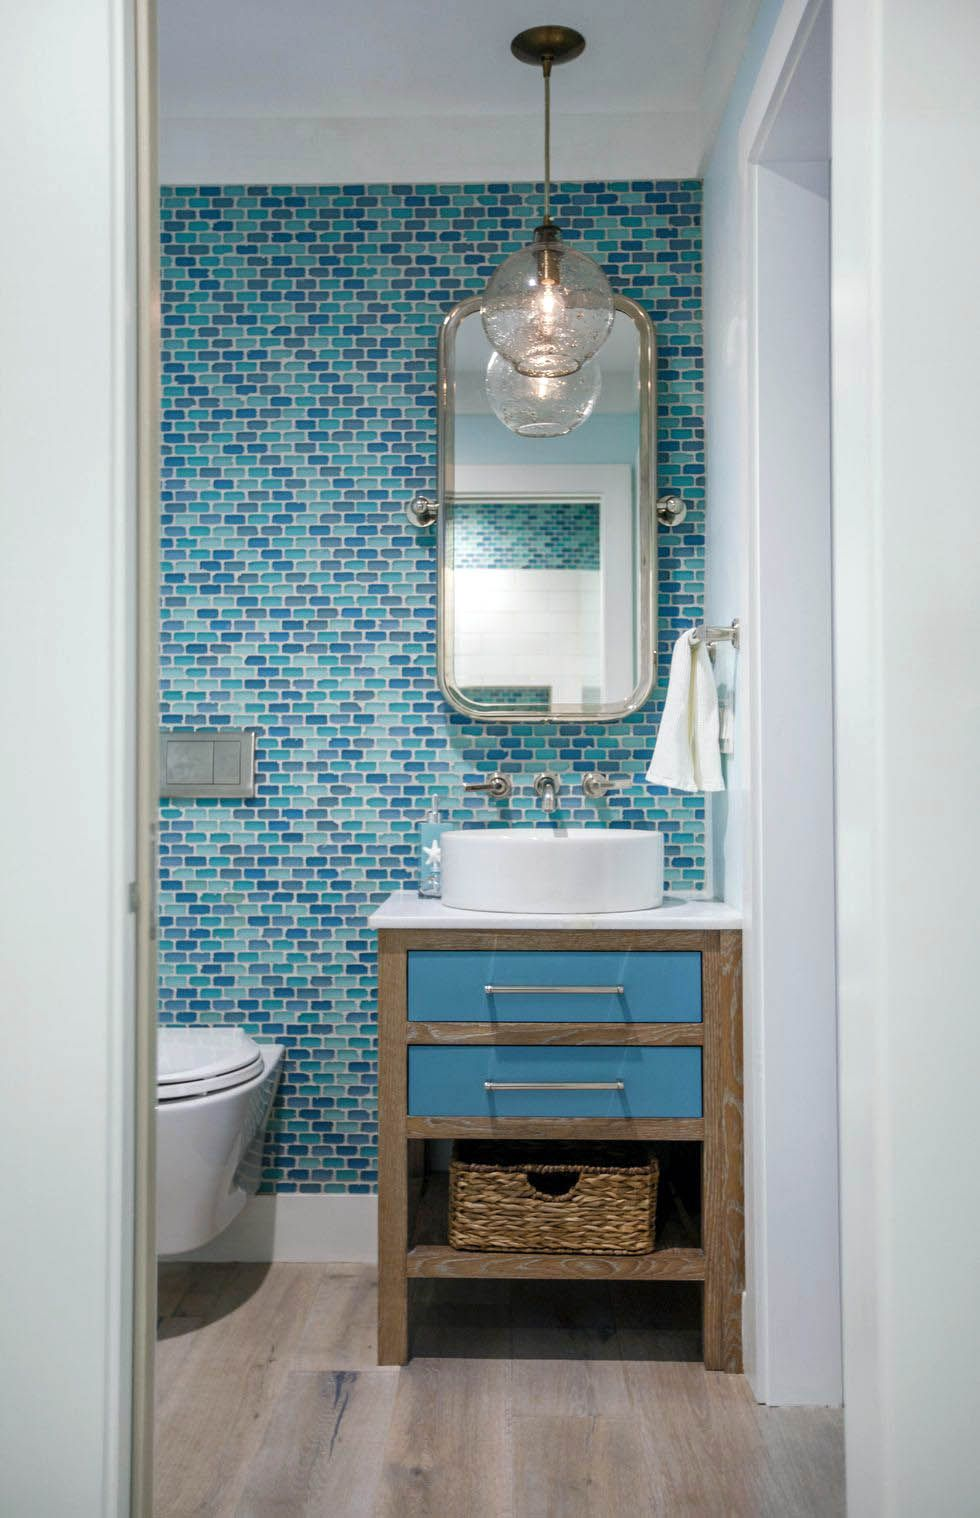 15 Astonishing Beach Themed Bathroom Designs Mostly In Blue